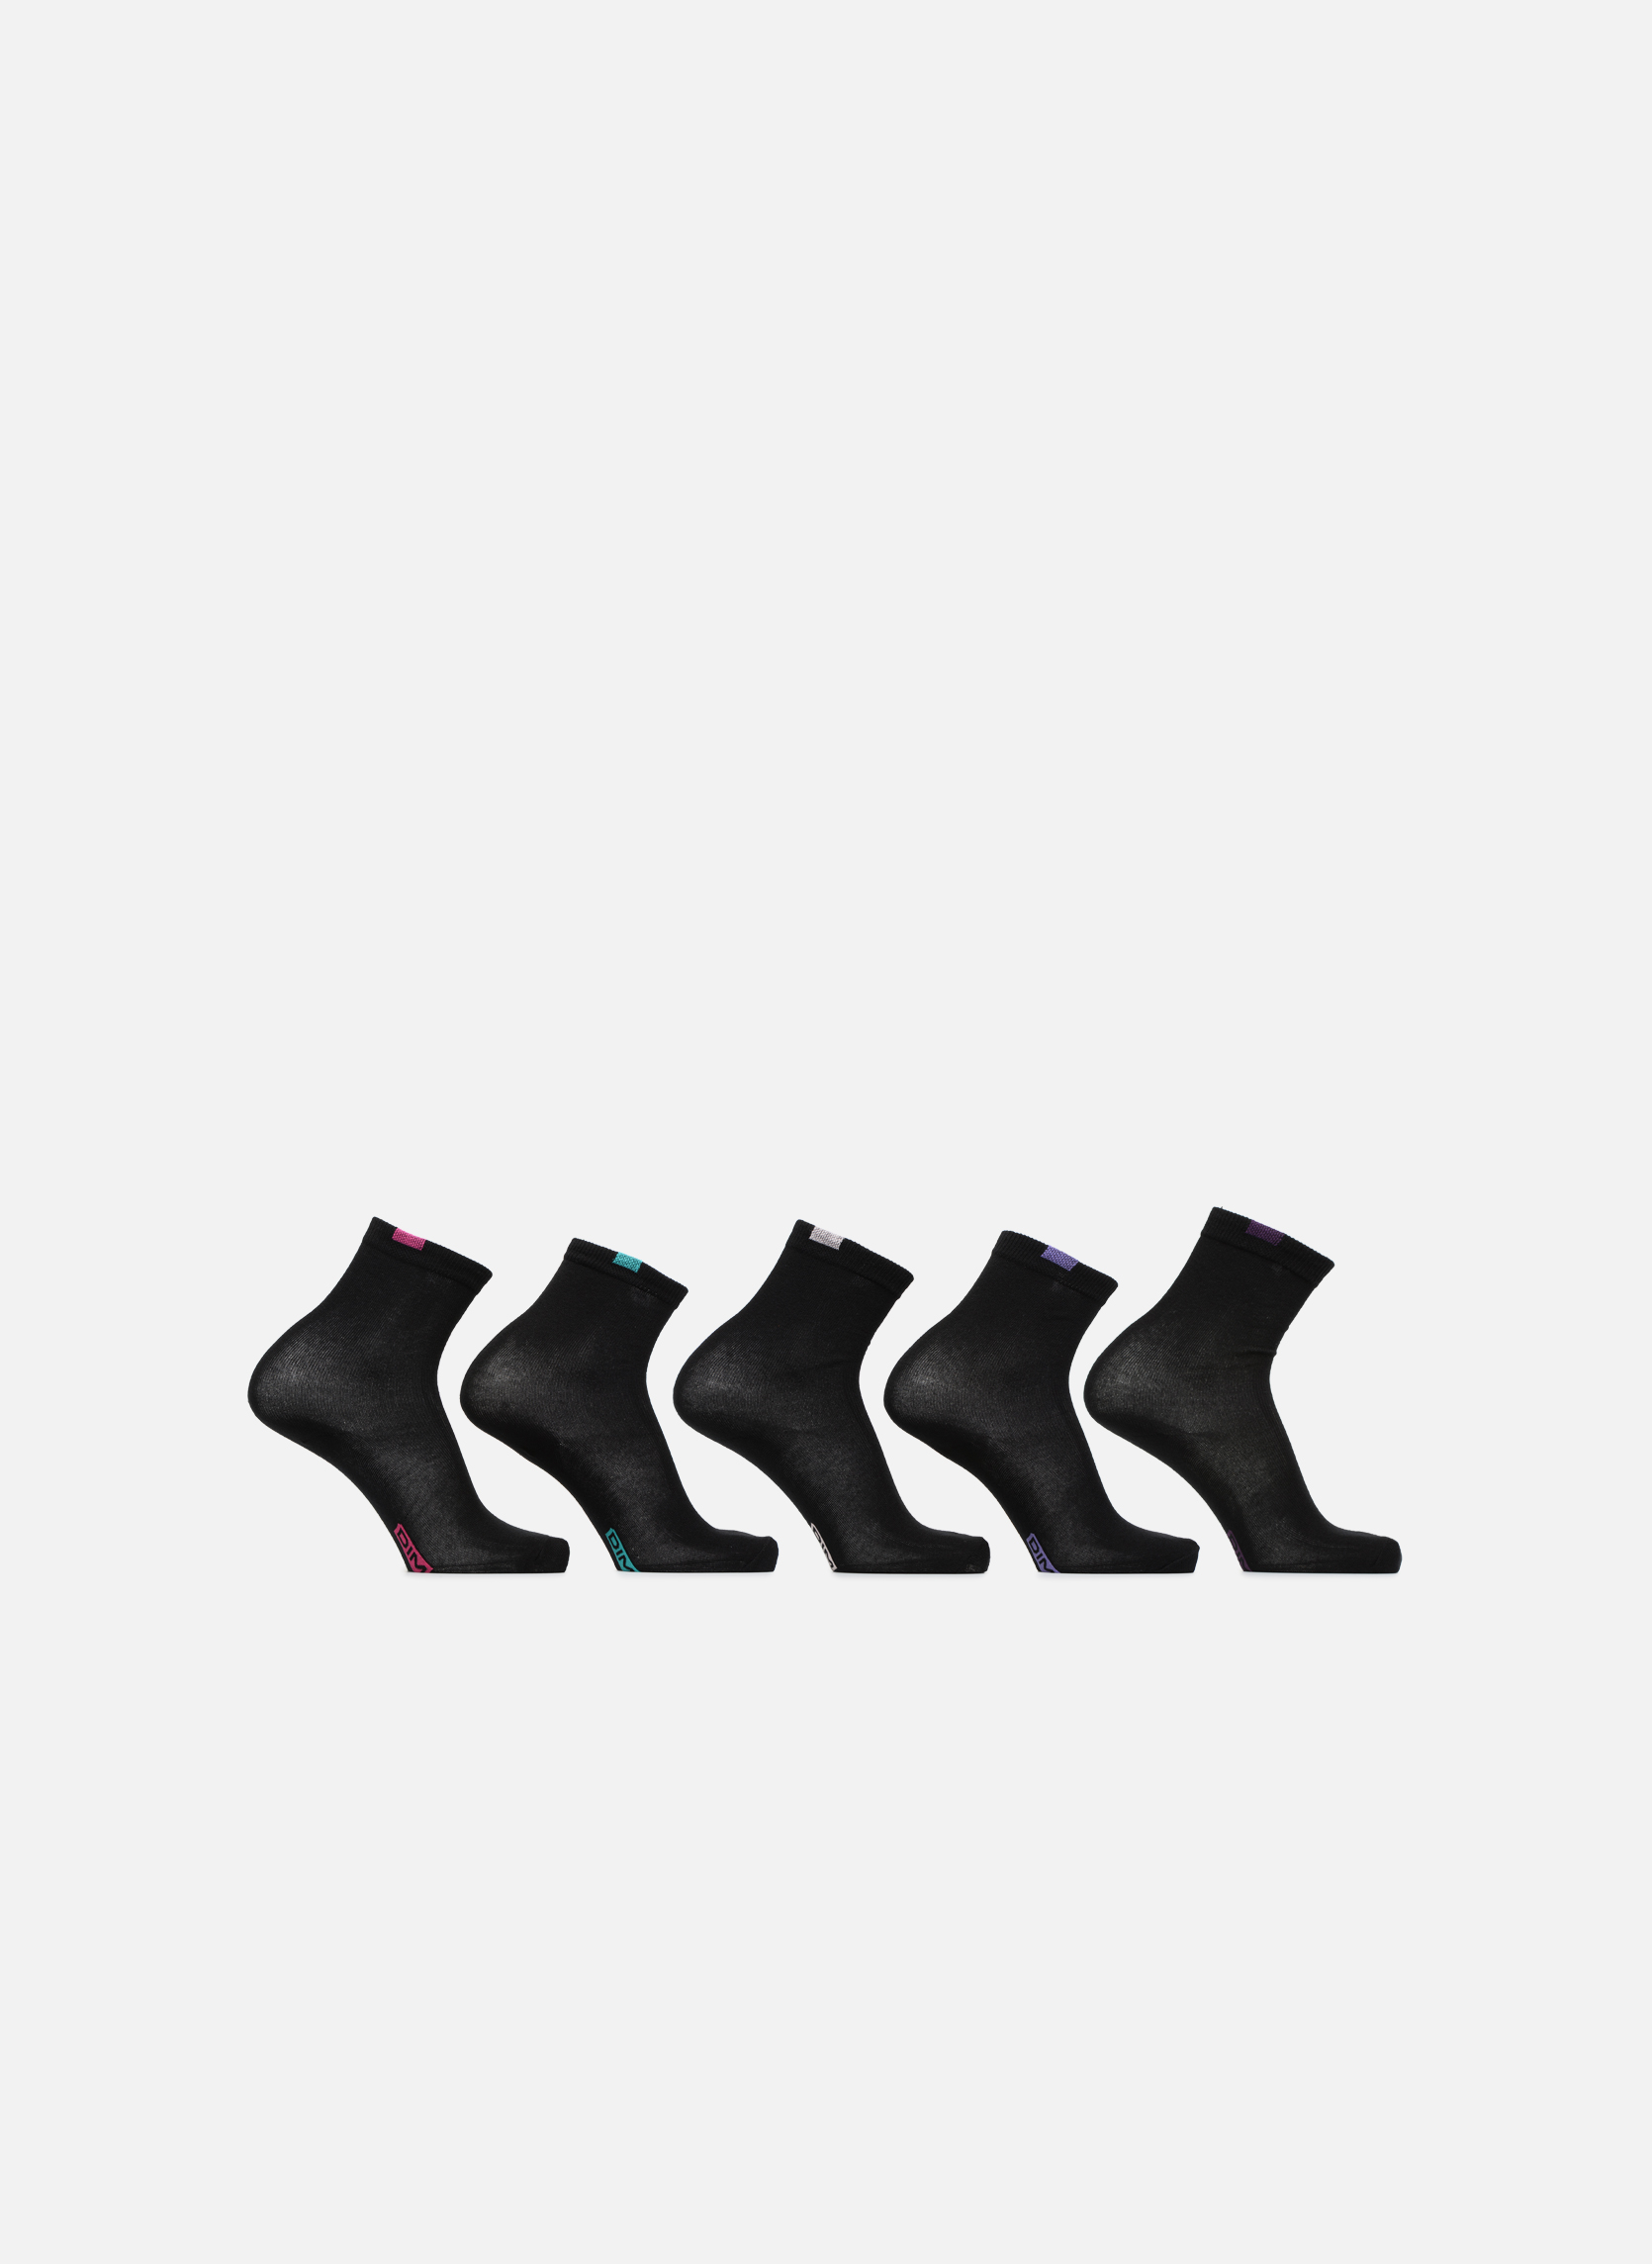 Mi-chaussettes ECODIM X5 Femme